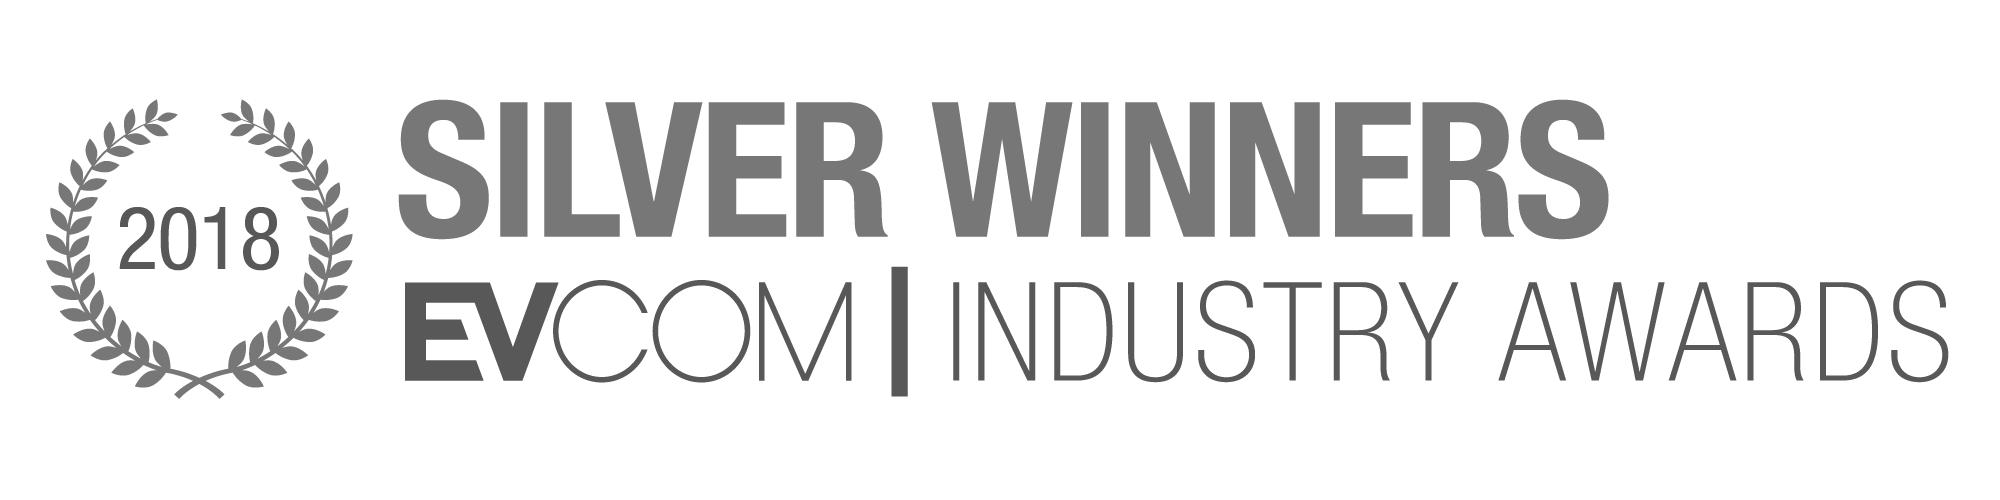 Silver_evcom2018_award_logo.png